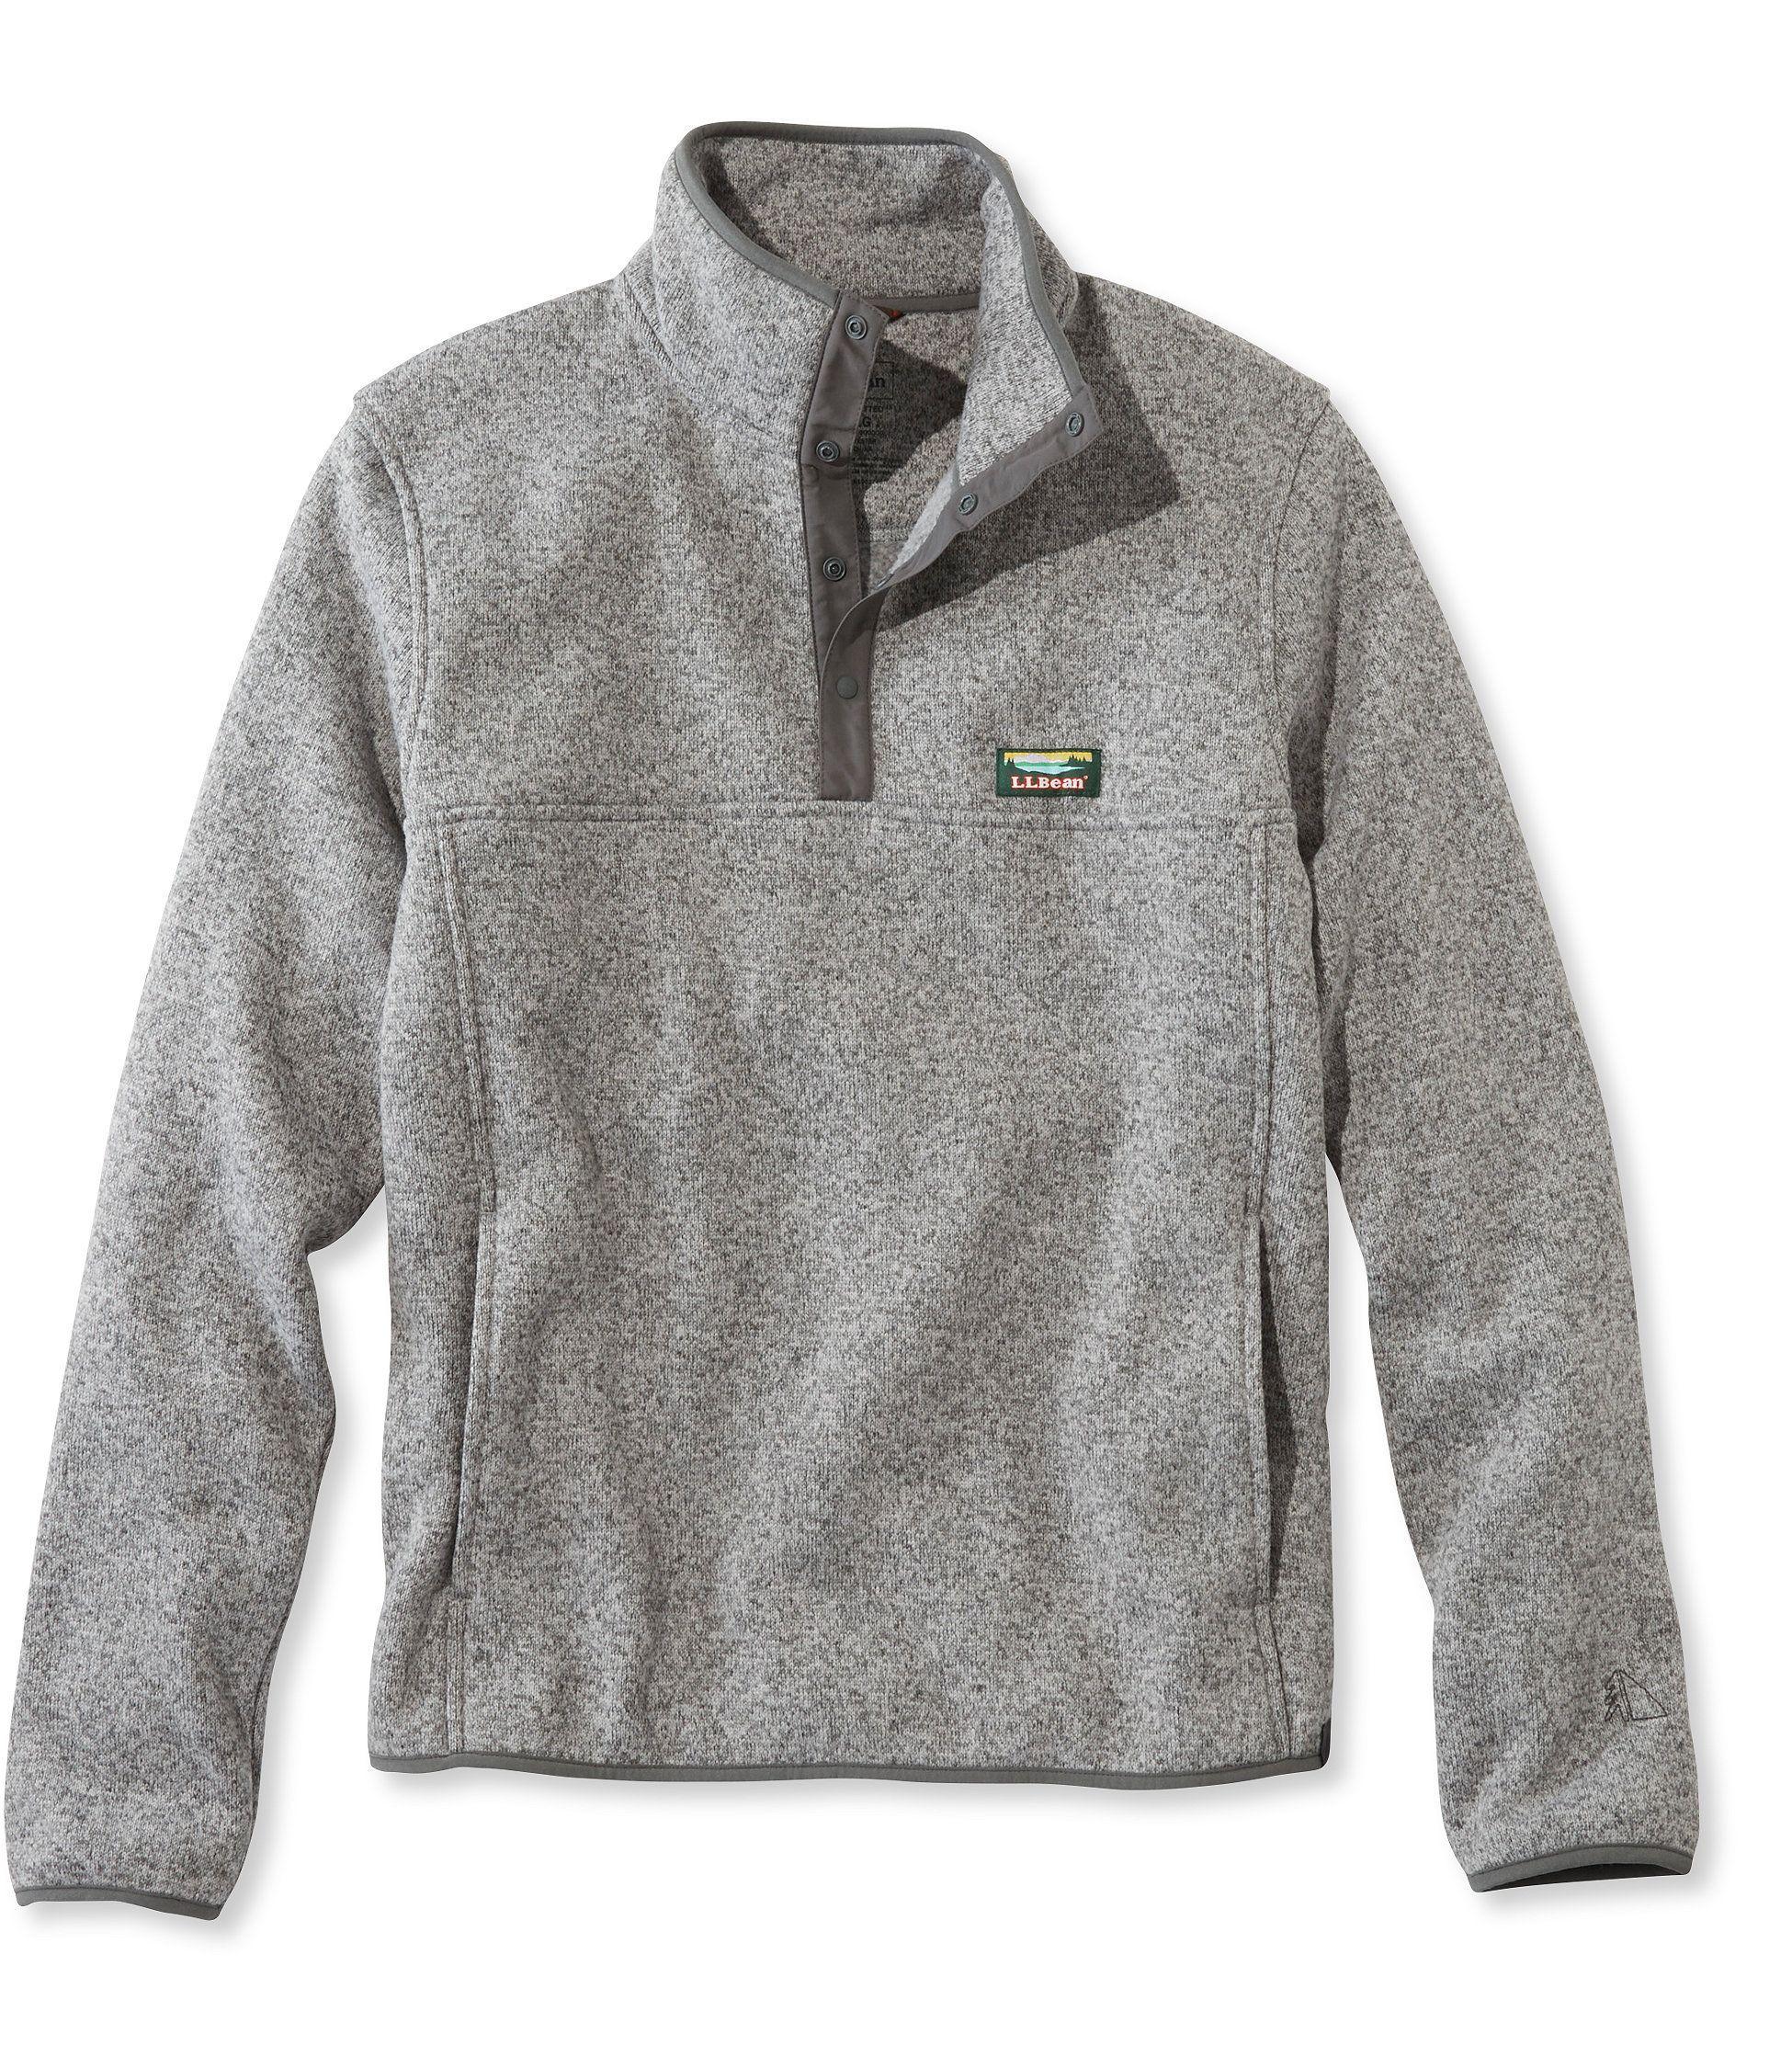 fe536f959 L.L.Bean Sweater Fleece Pullover